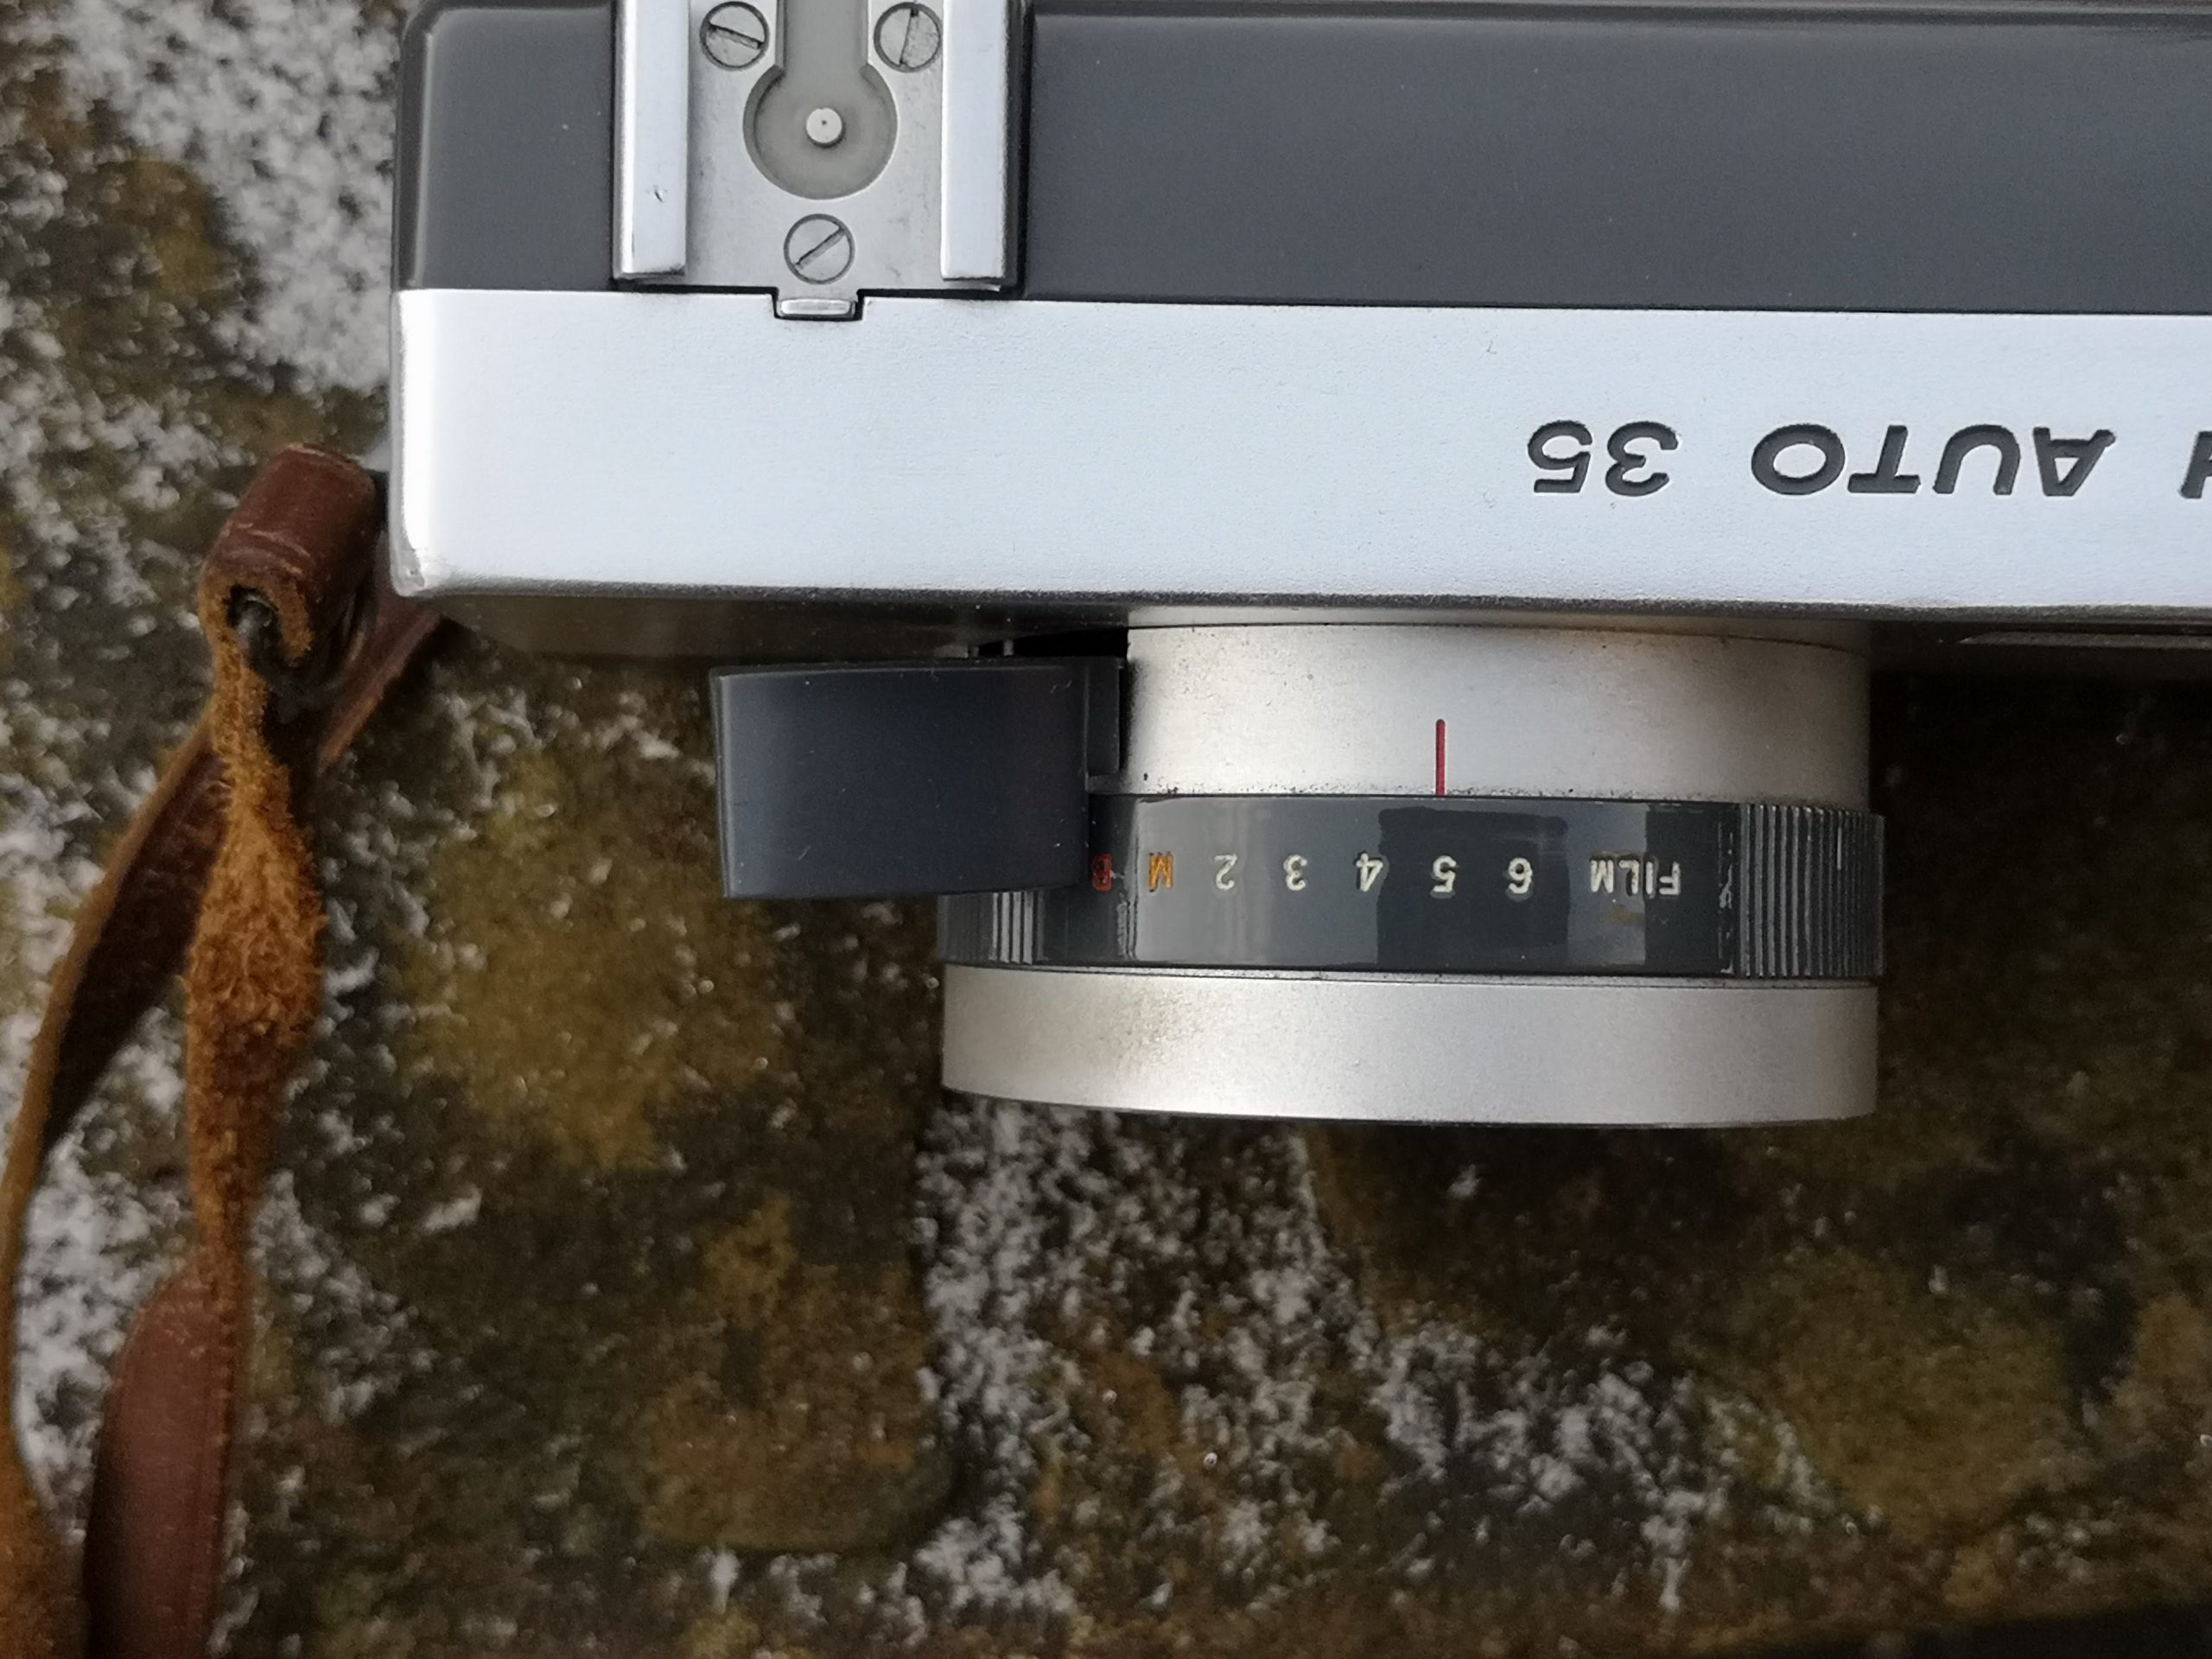 Film speed dial on Ricoh Auto 35